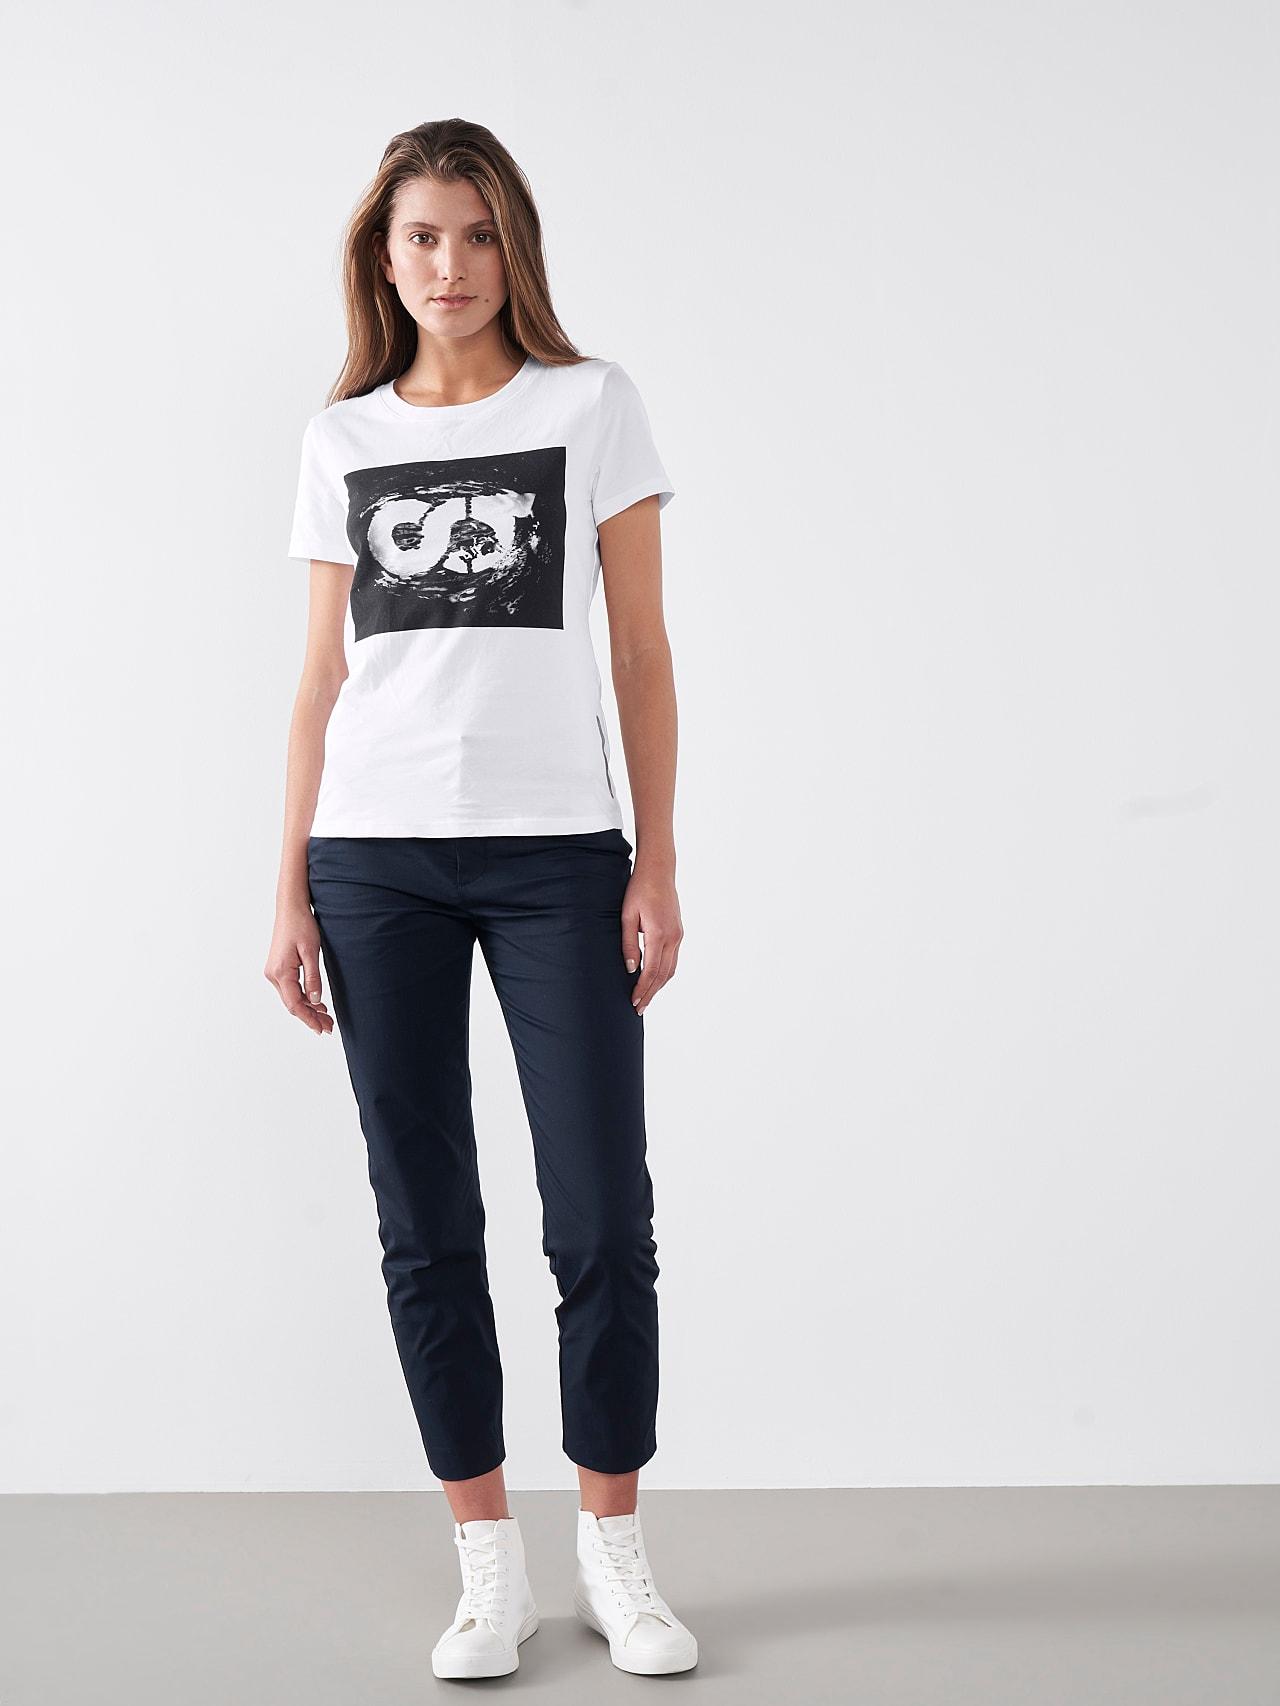 JALP V4.Y5.01 Cotton Logo T-Shirt white Front Alpha Tauri